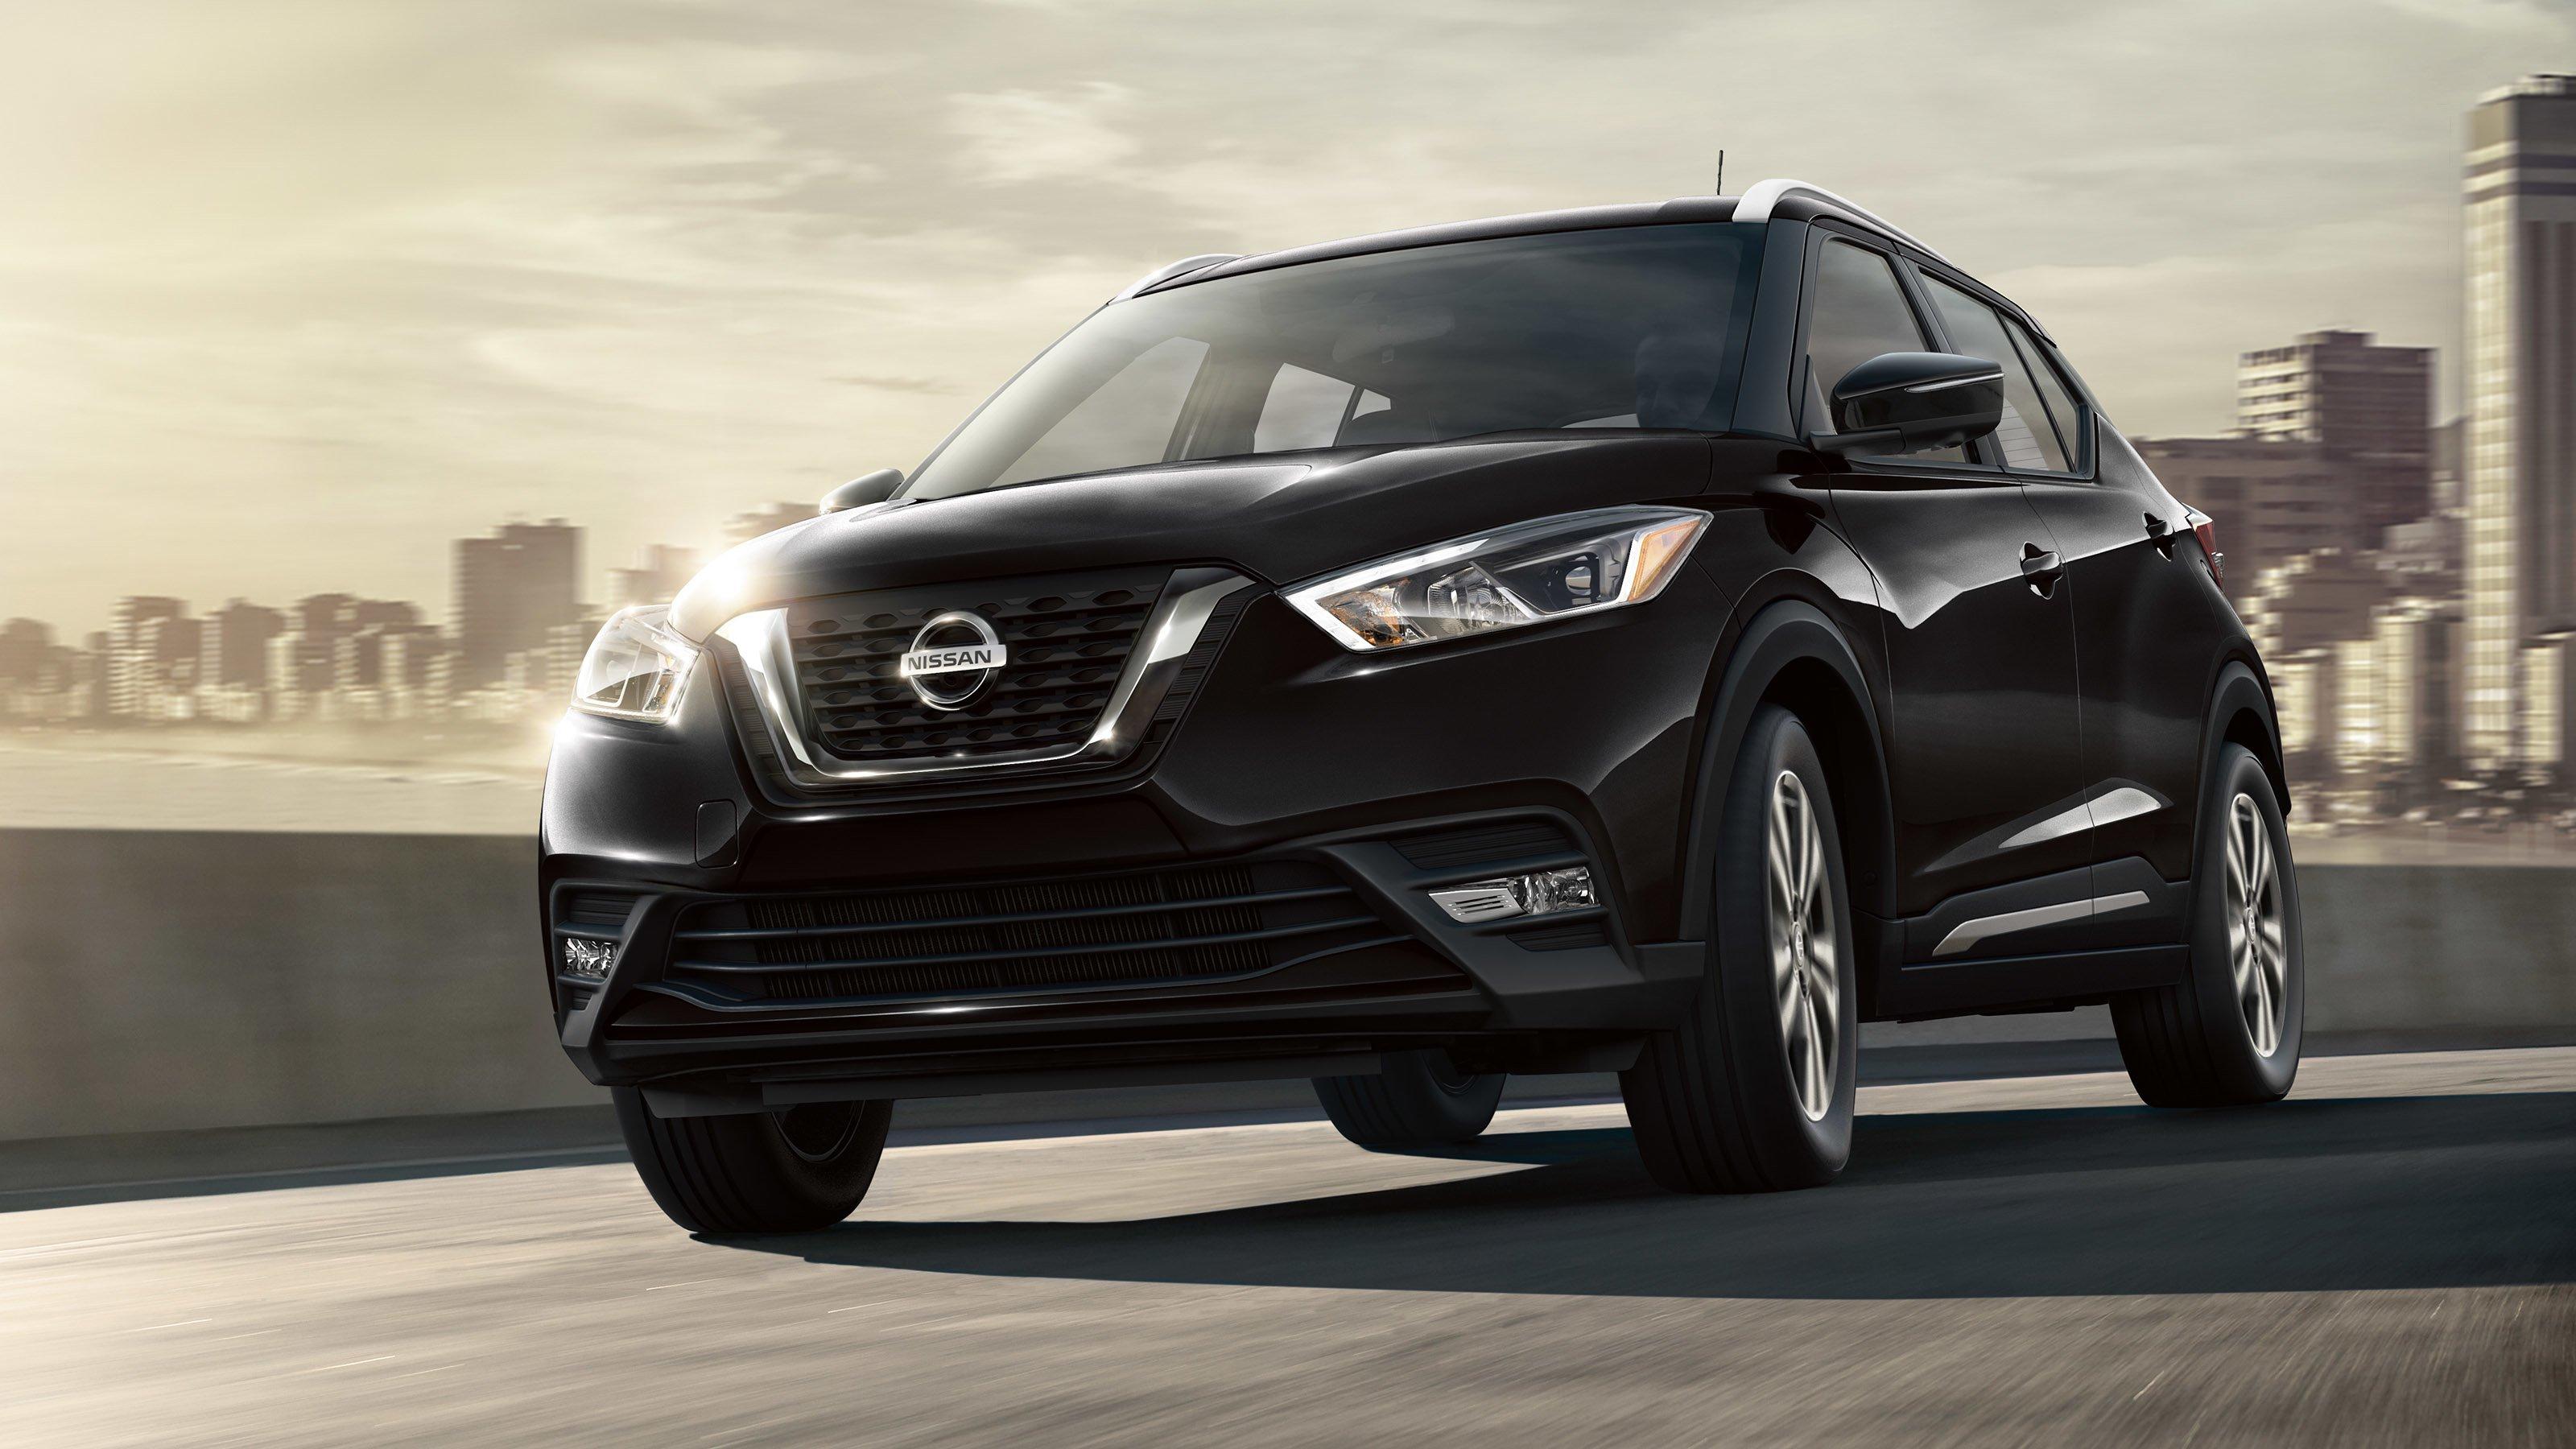 Nissan Kicks Price & Lease Offer | Jeff Wyler | Fairfield OH